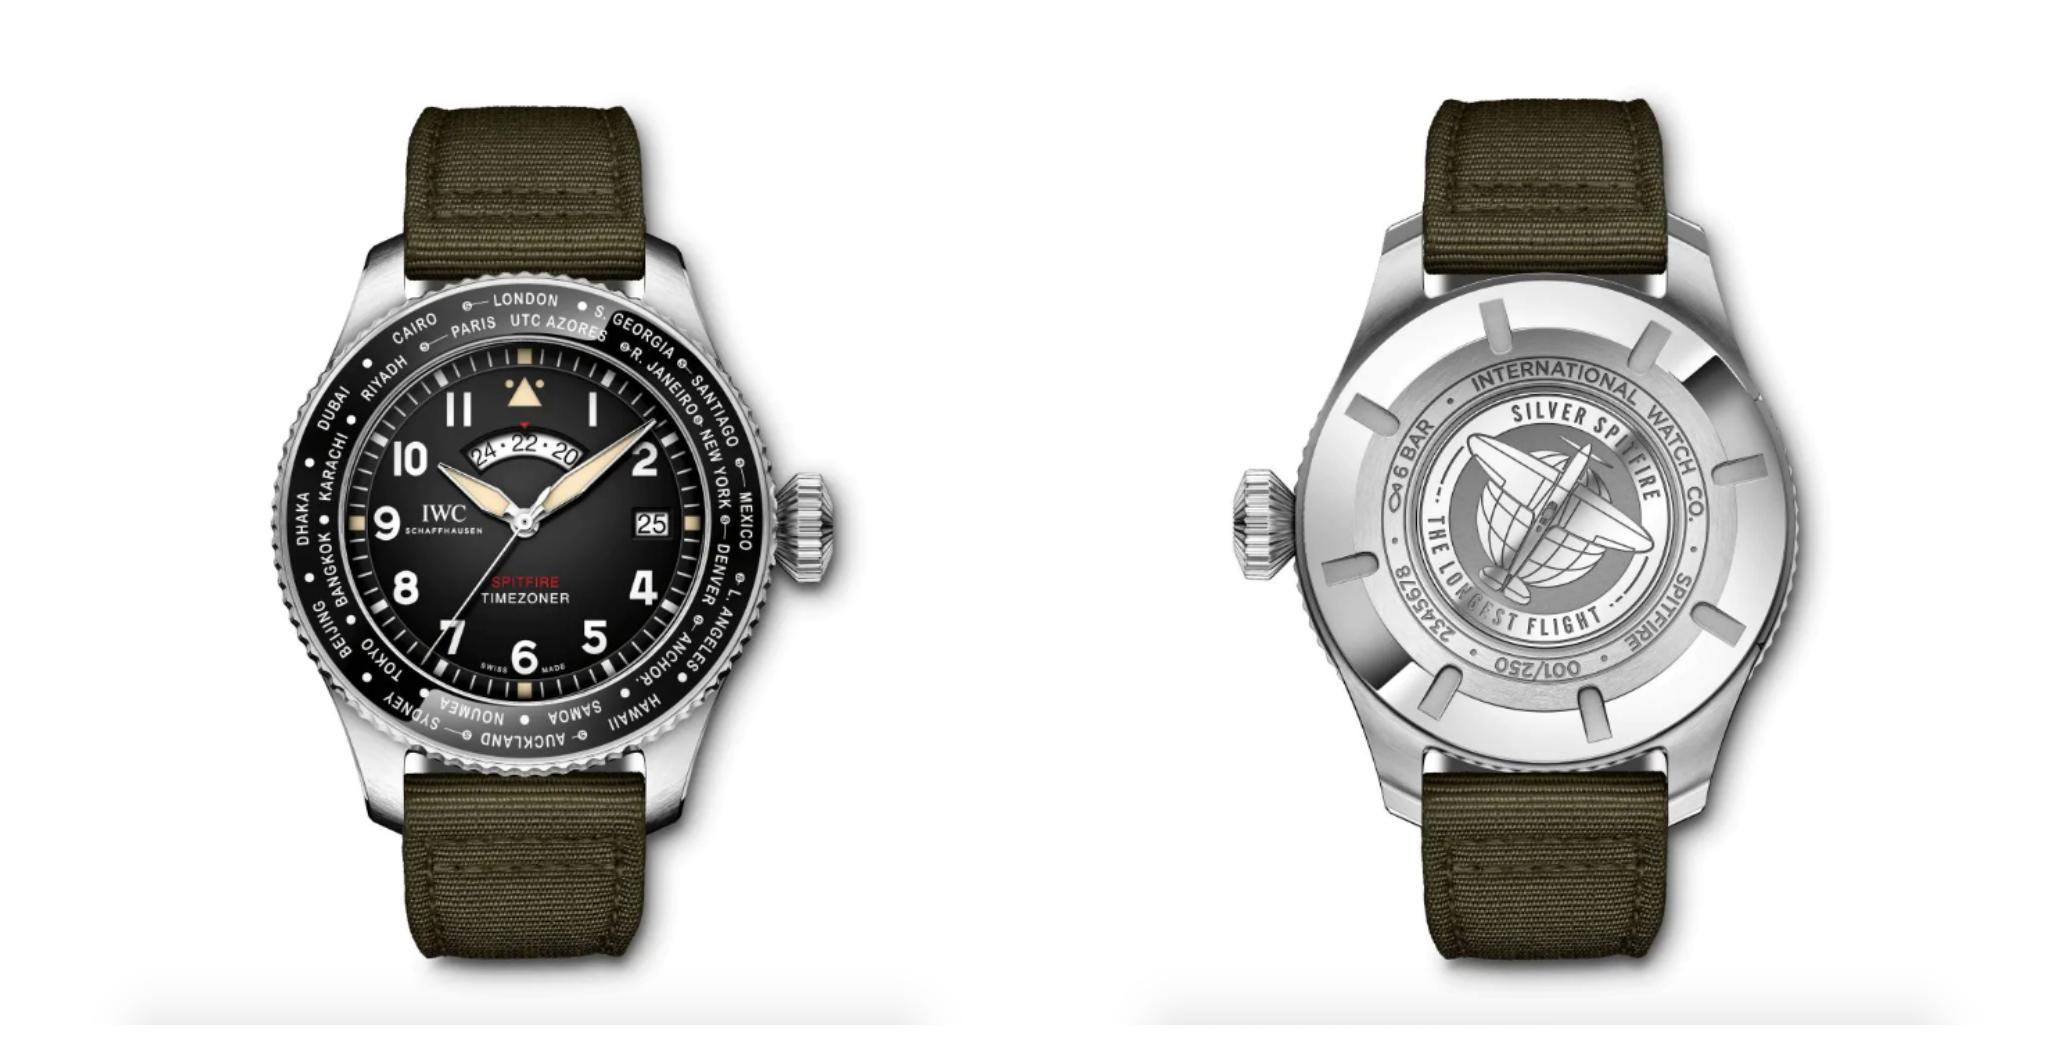 IWC Pilot's Watch Timezoner Spitfire Edition